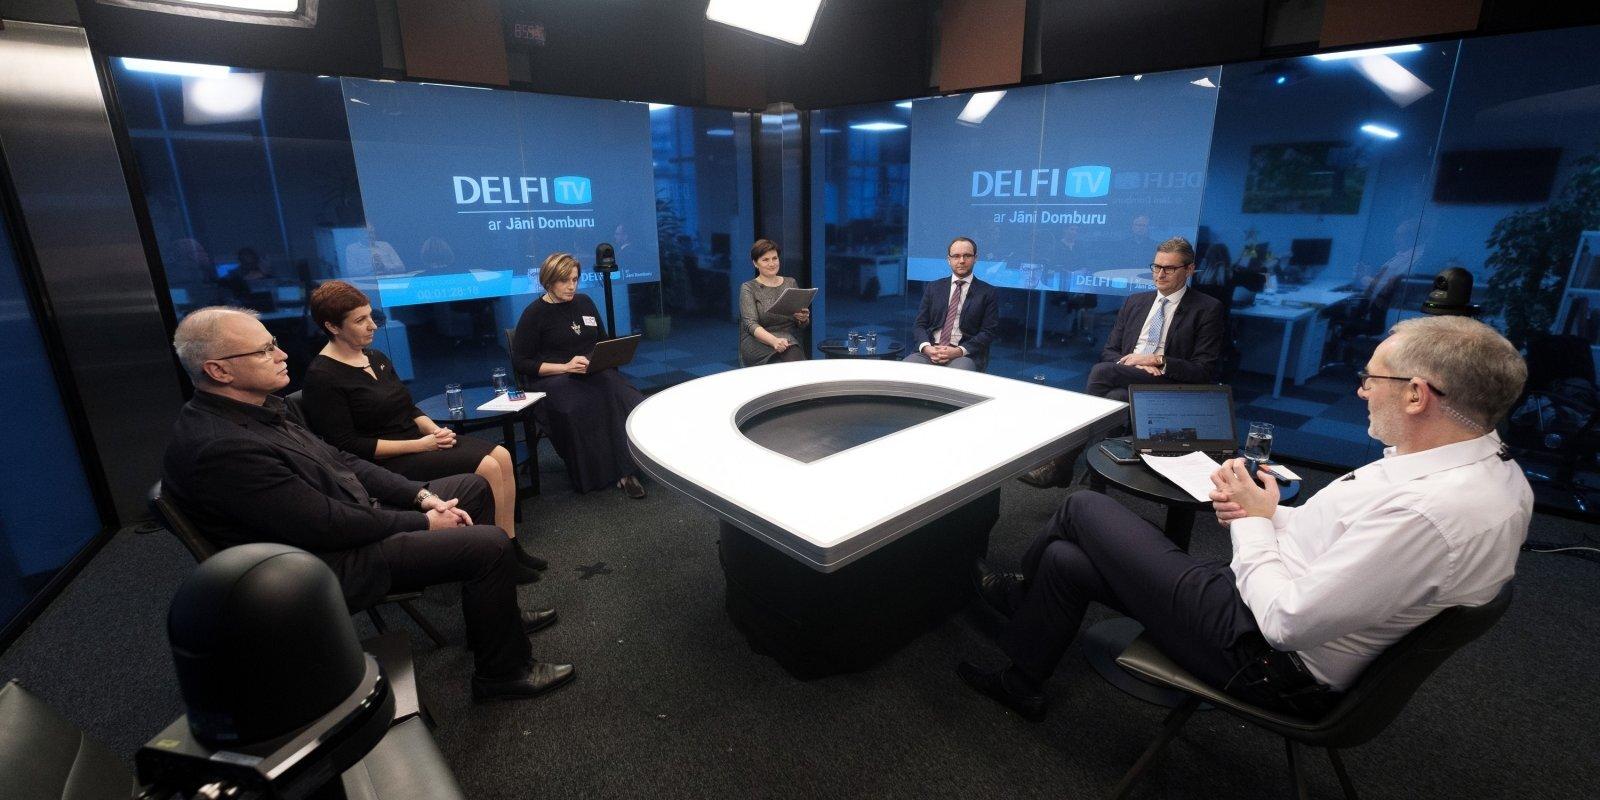 'Delfi TV ar Jāni Domburu' diskutē mediķi un politiķi. Pilns teksts